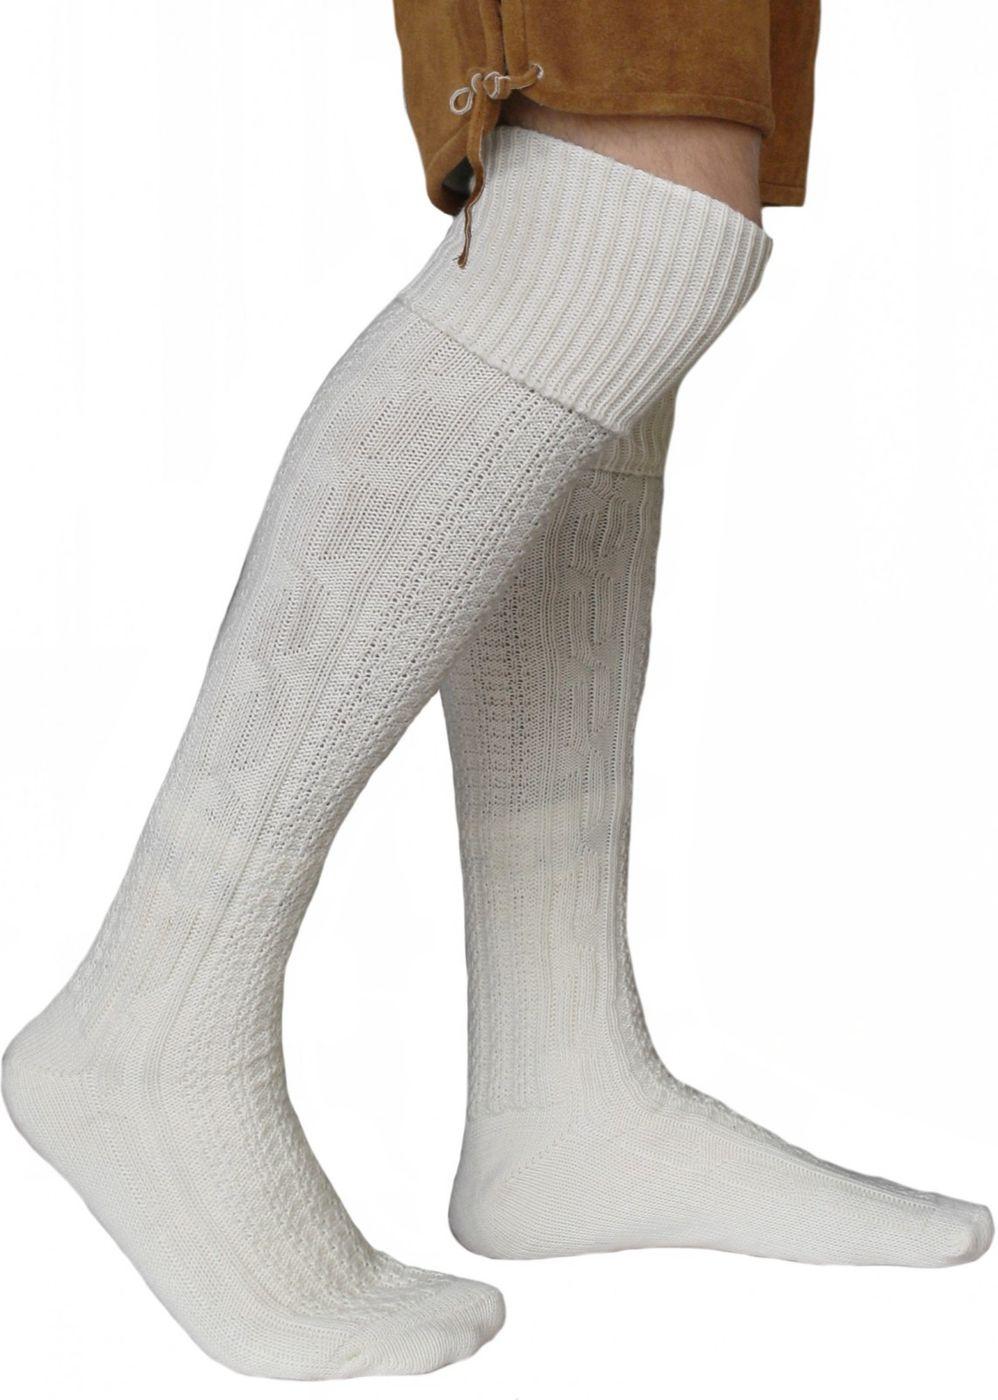 EXTRA Lange Trachtensocken Strümpfe Trachtenlederhose Socken Wolle 75cm